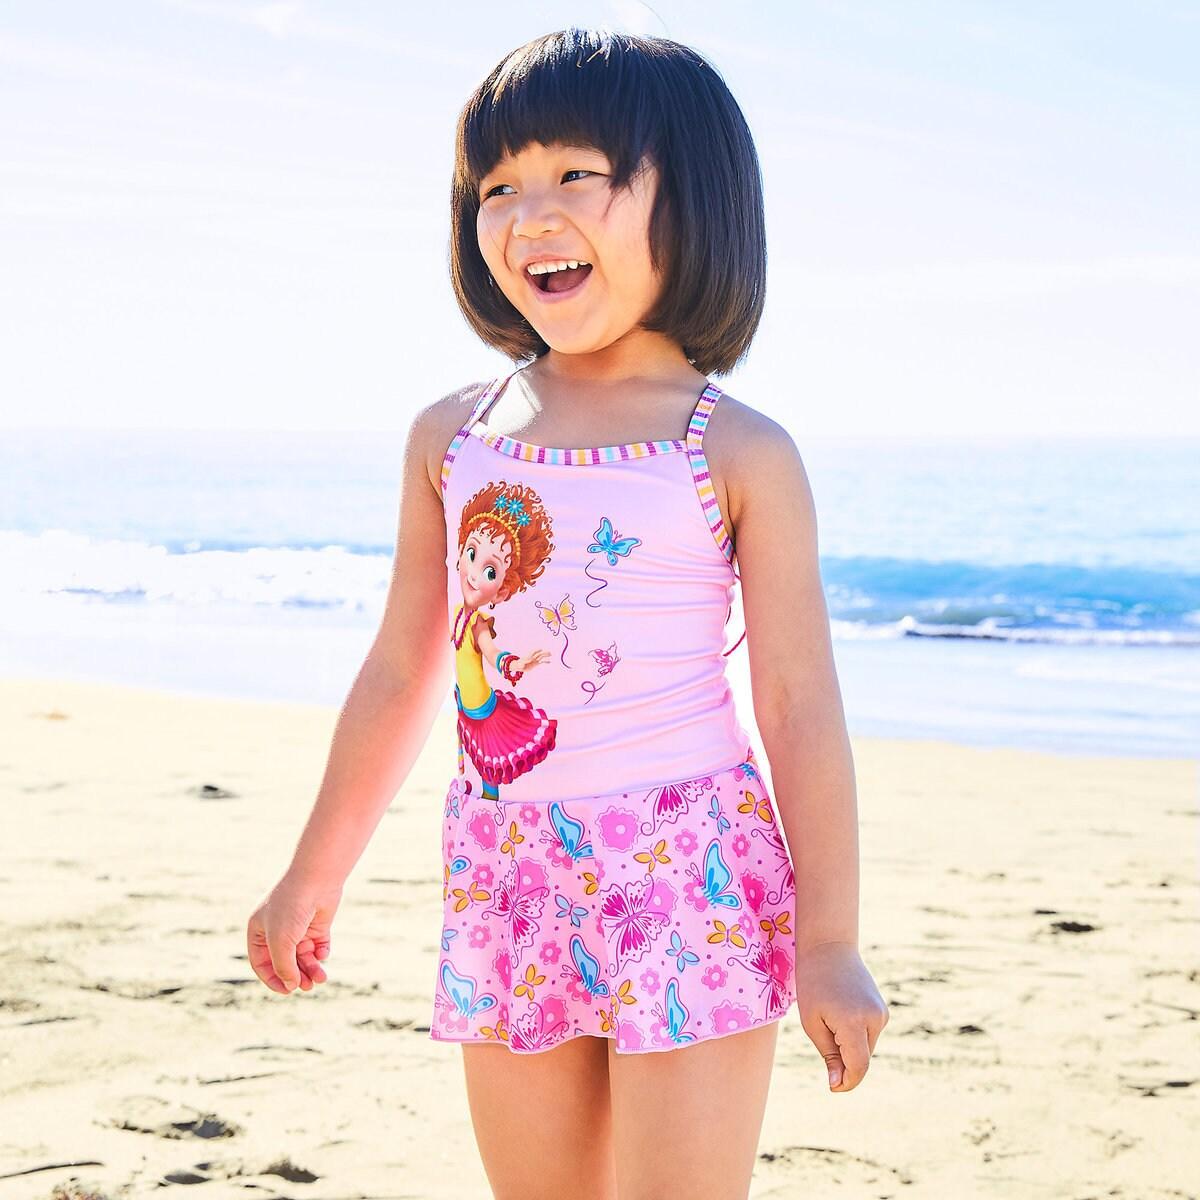 9501ae7e0c Fancy Nancy Swimsuit for Girls   shopDisney